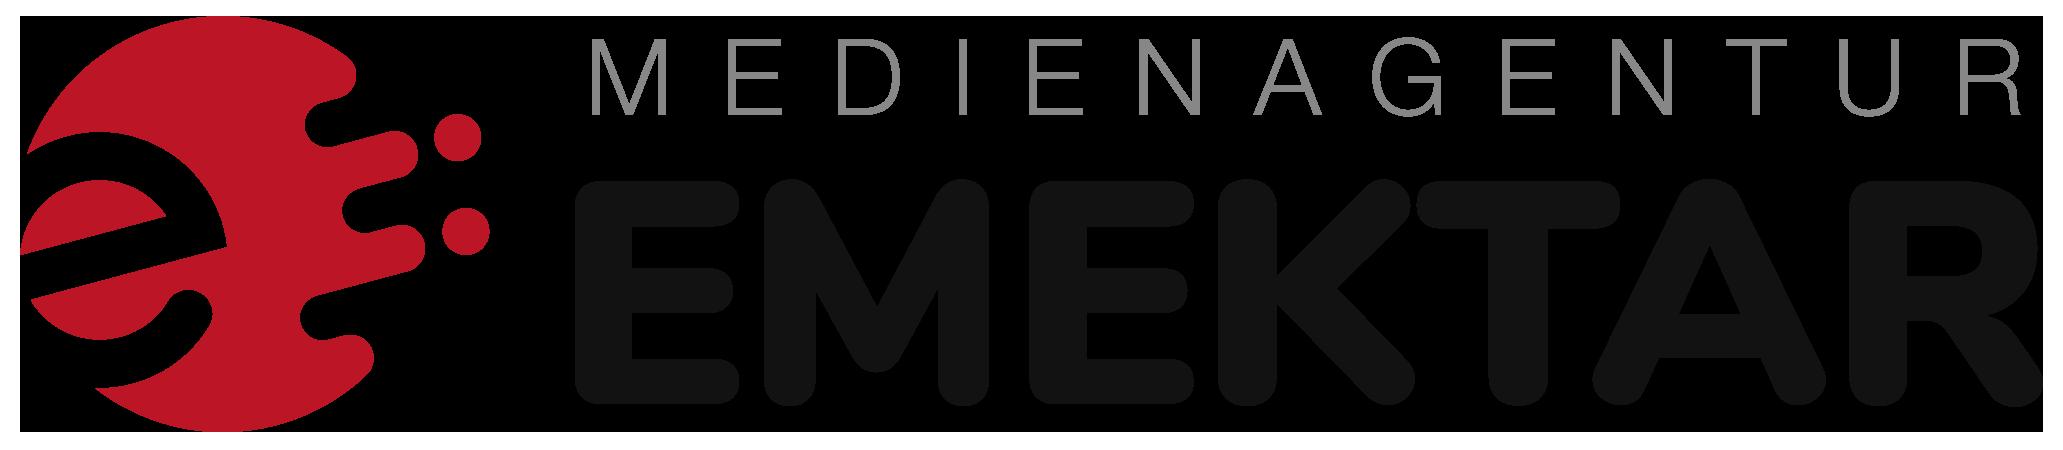 logo-medienagentur